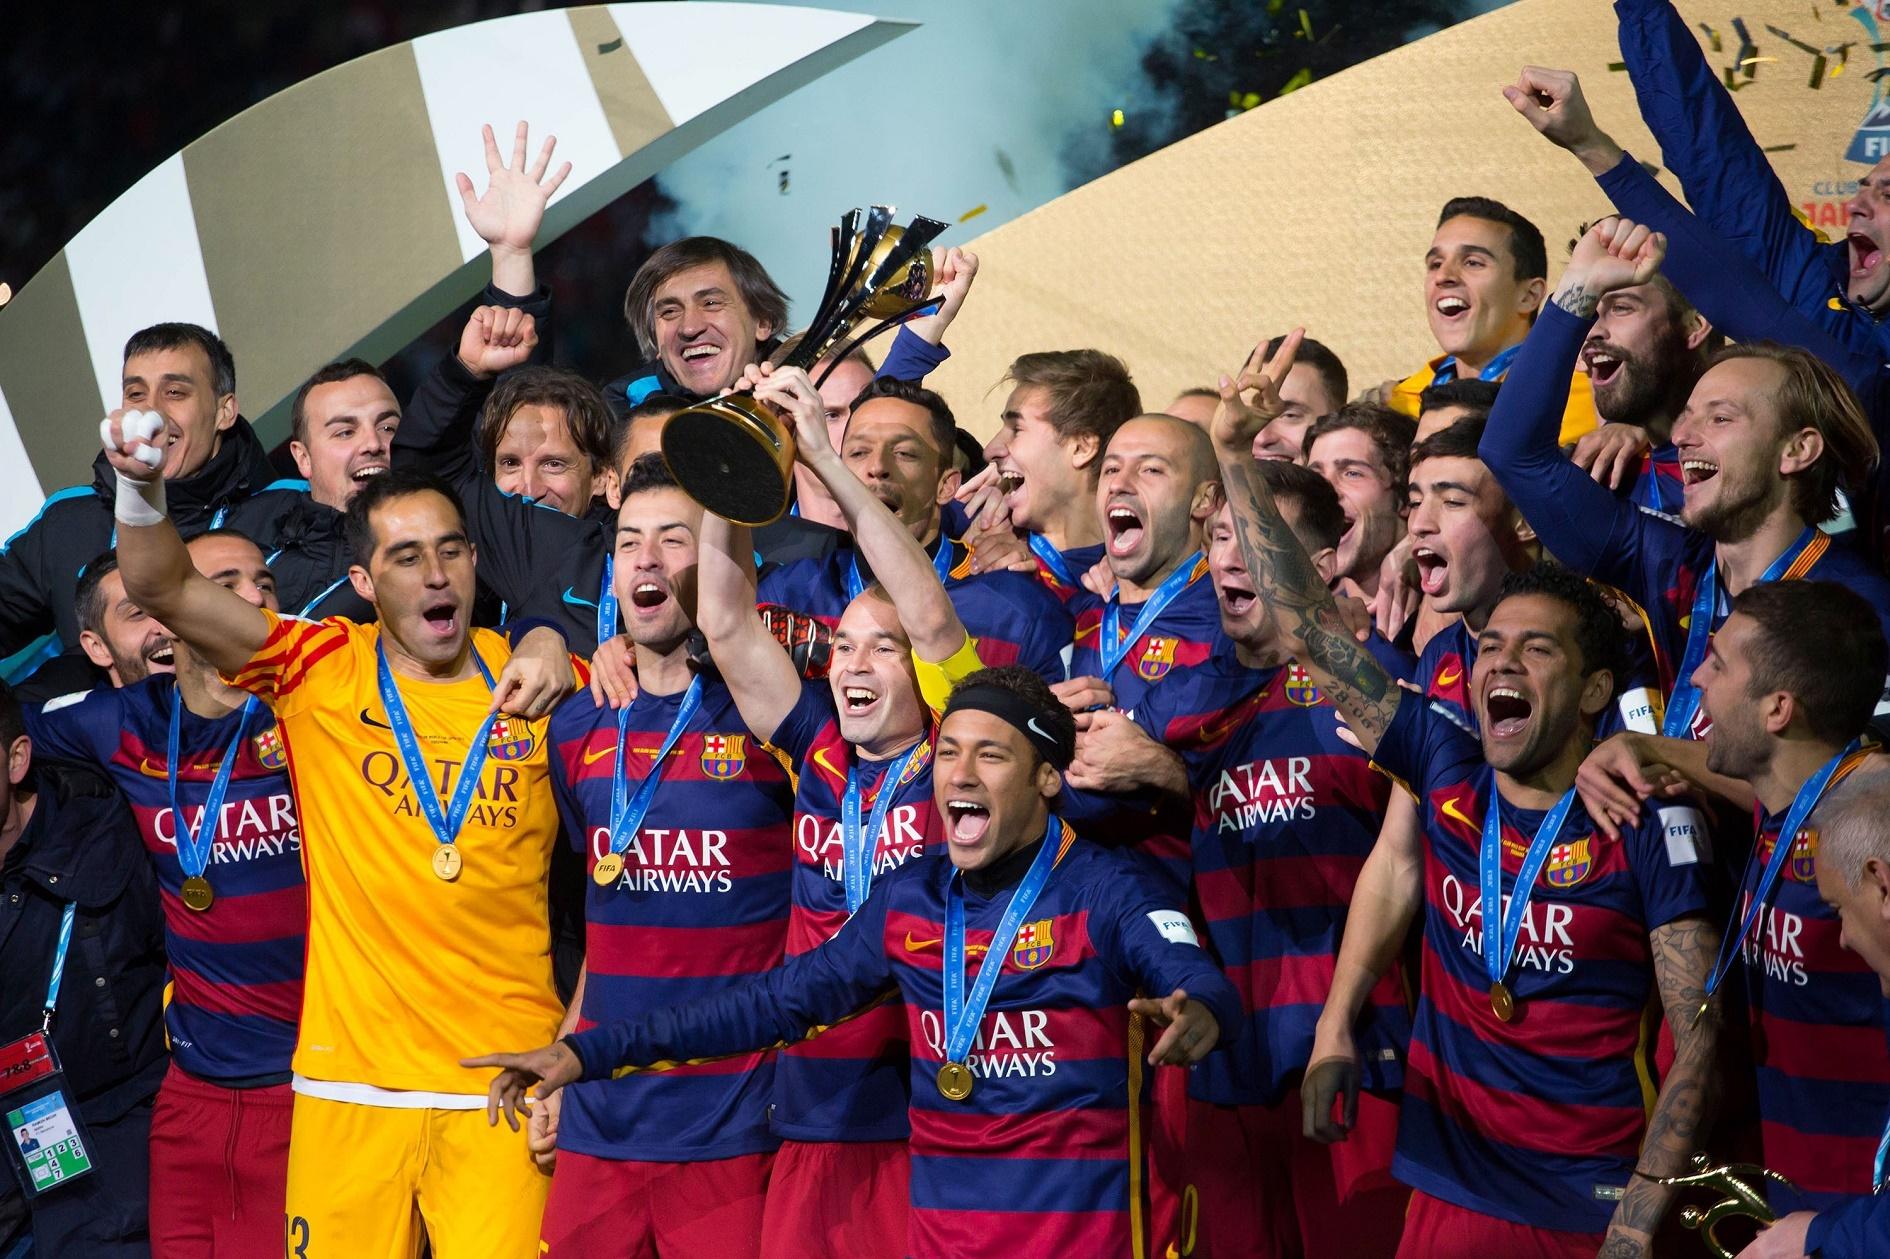 Pelo terceiro ano seguido, o título máximo dos clubes vai para a Europa. O Barcelona superou na final o River Plate, da Argentina, por acachapantes 3 a 0, expressão do abismo que separa a qualidade técnica nos dois lados do planeta bola